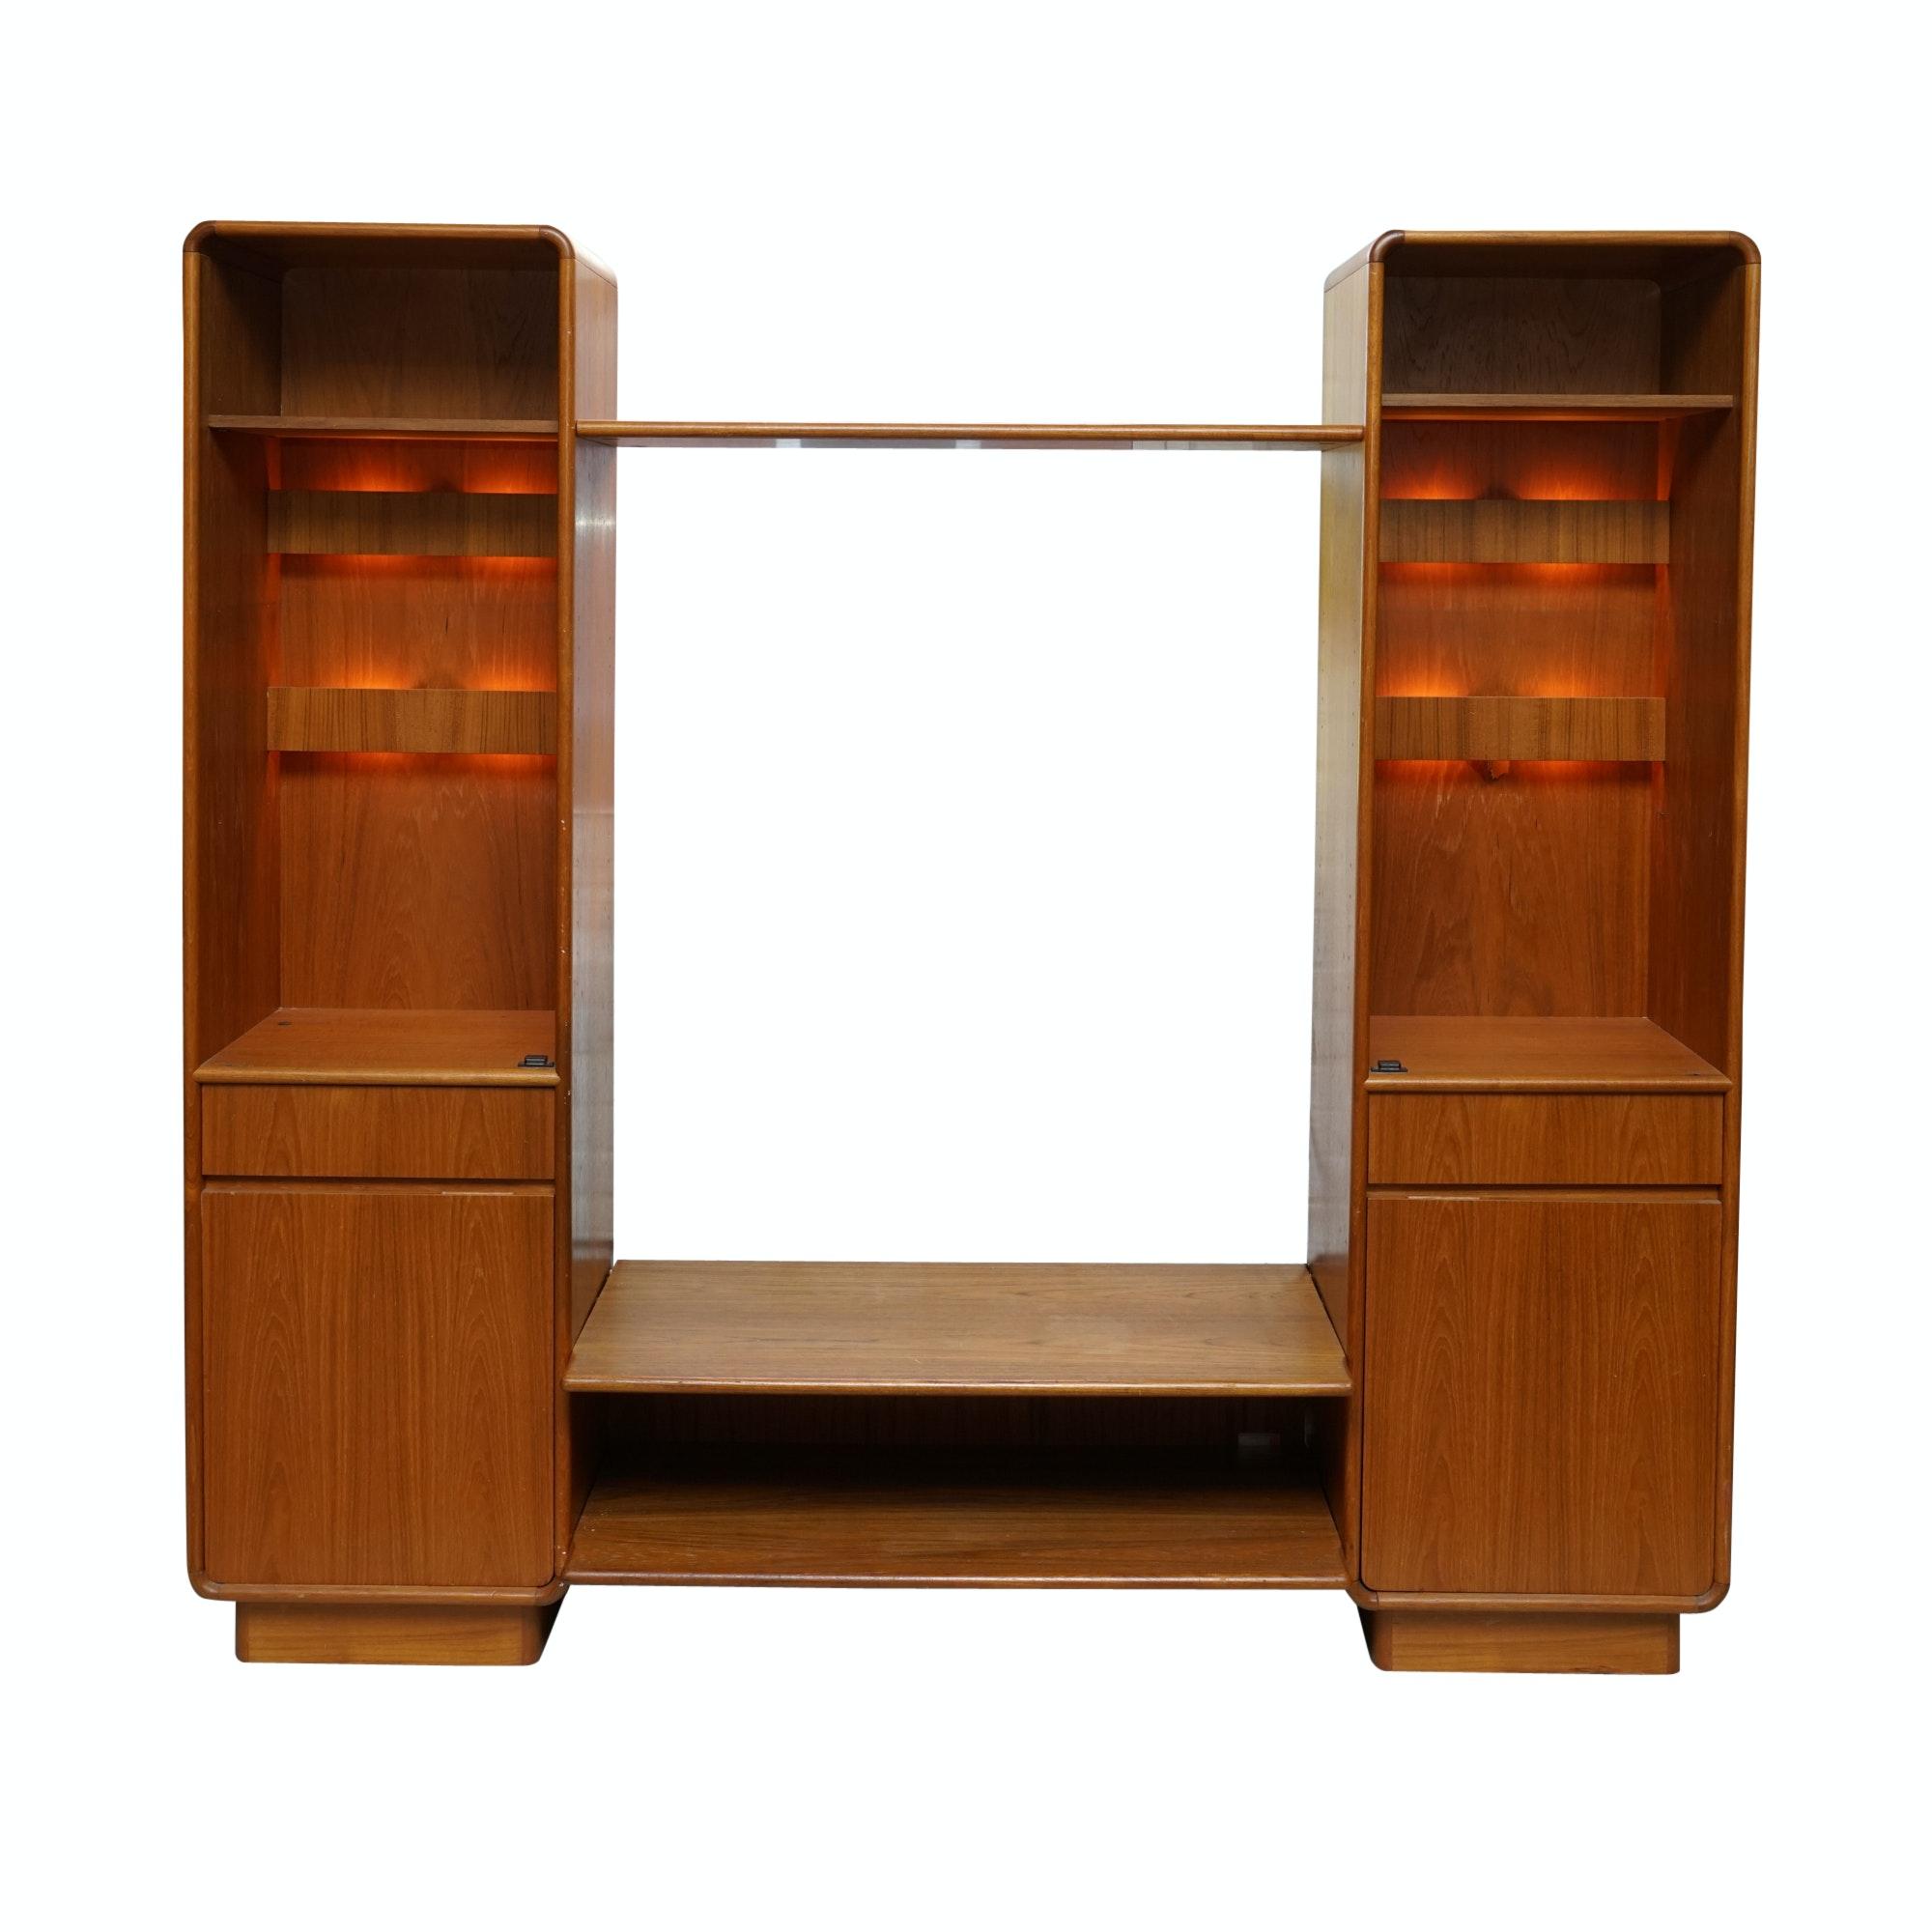 Danish Modern Illuminated Entertainment Cabinet and Shelves